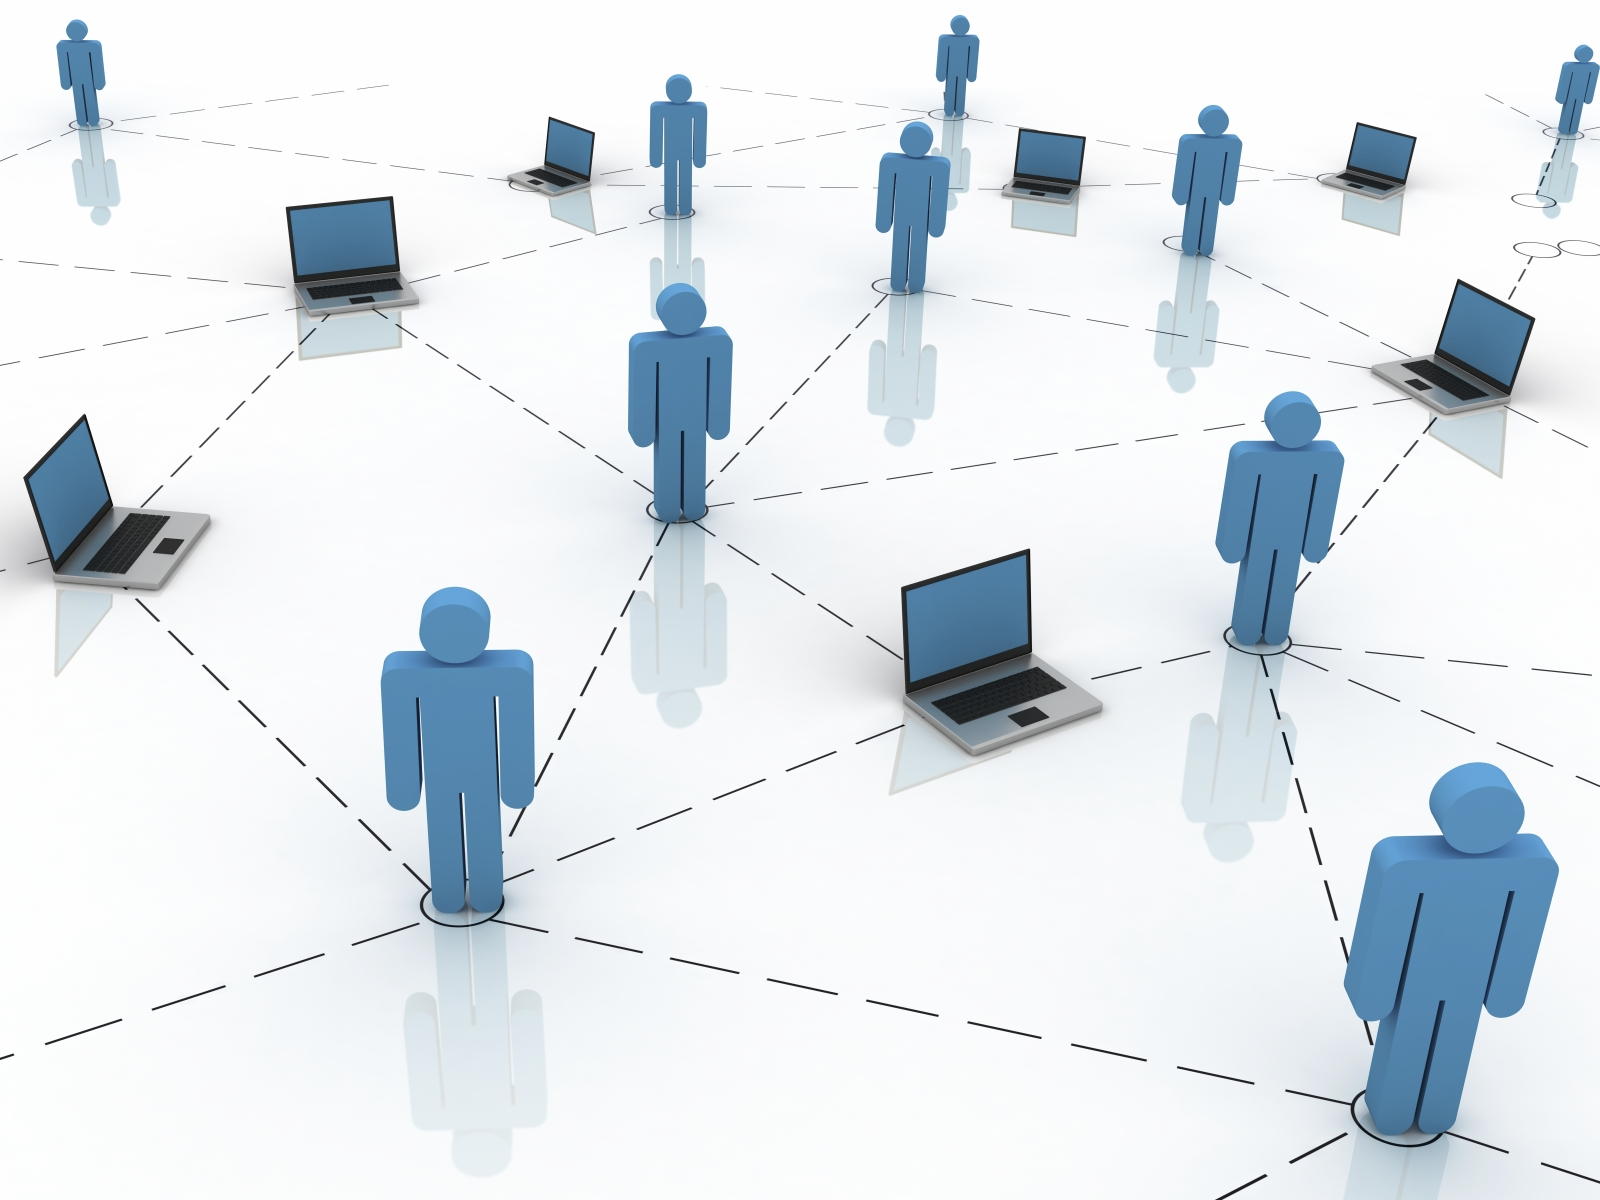 Установка антивируса на компьютер